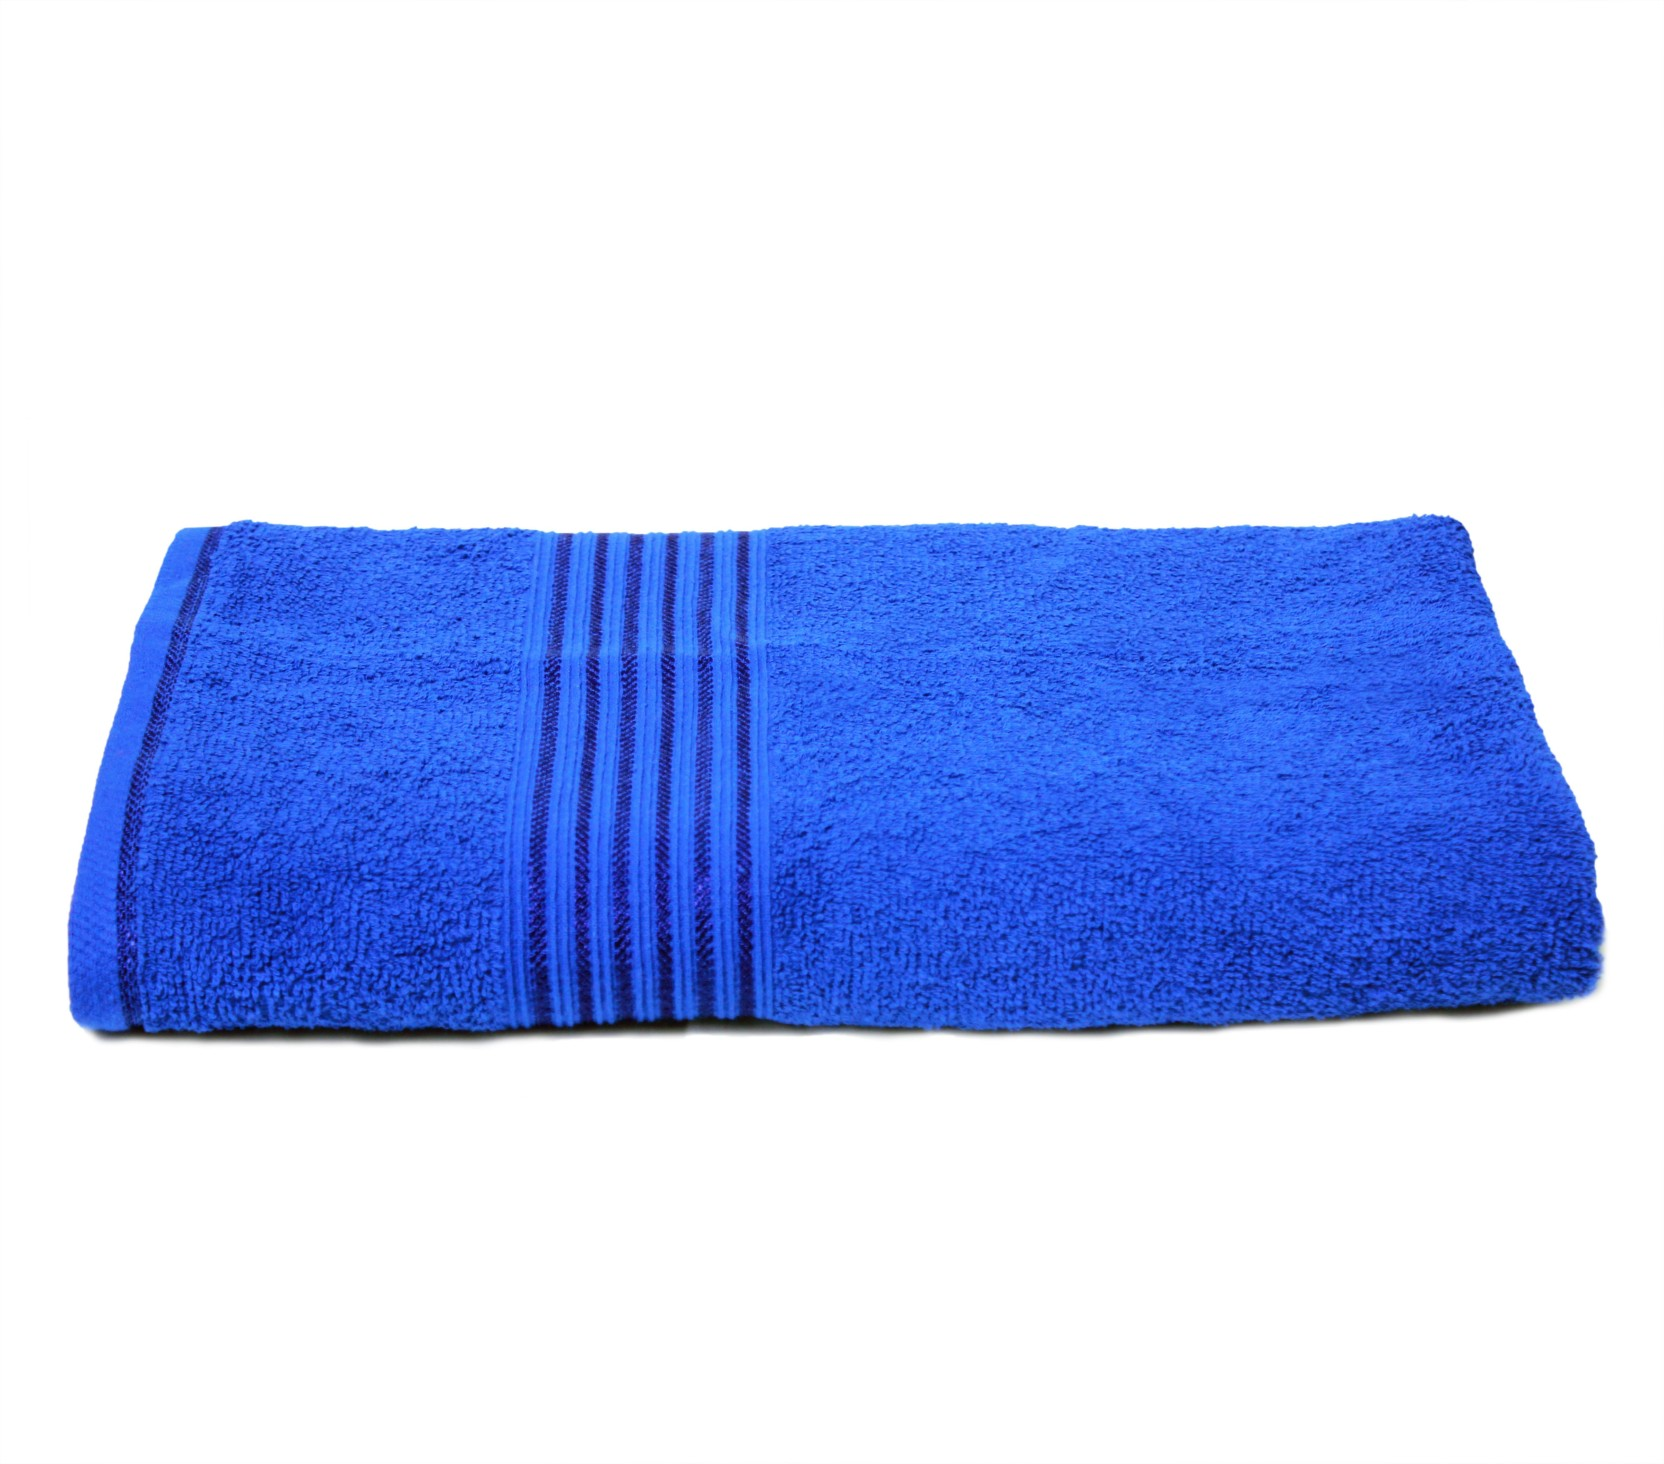 Buy CURL UP Cotton Bath Towel